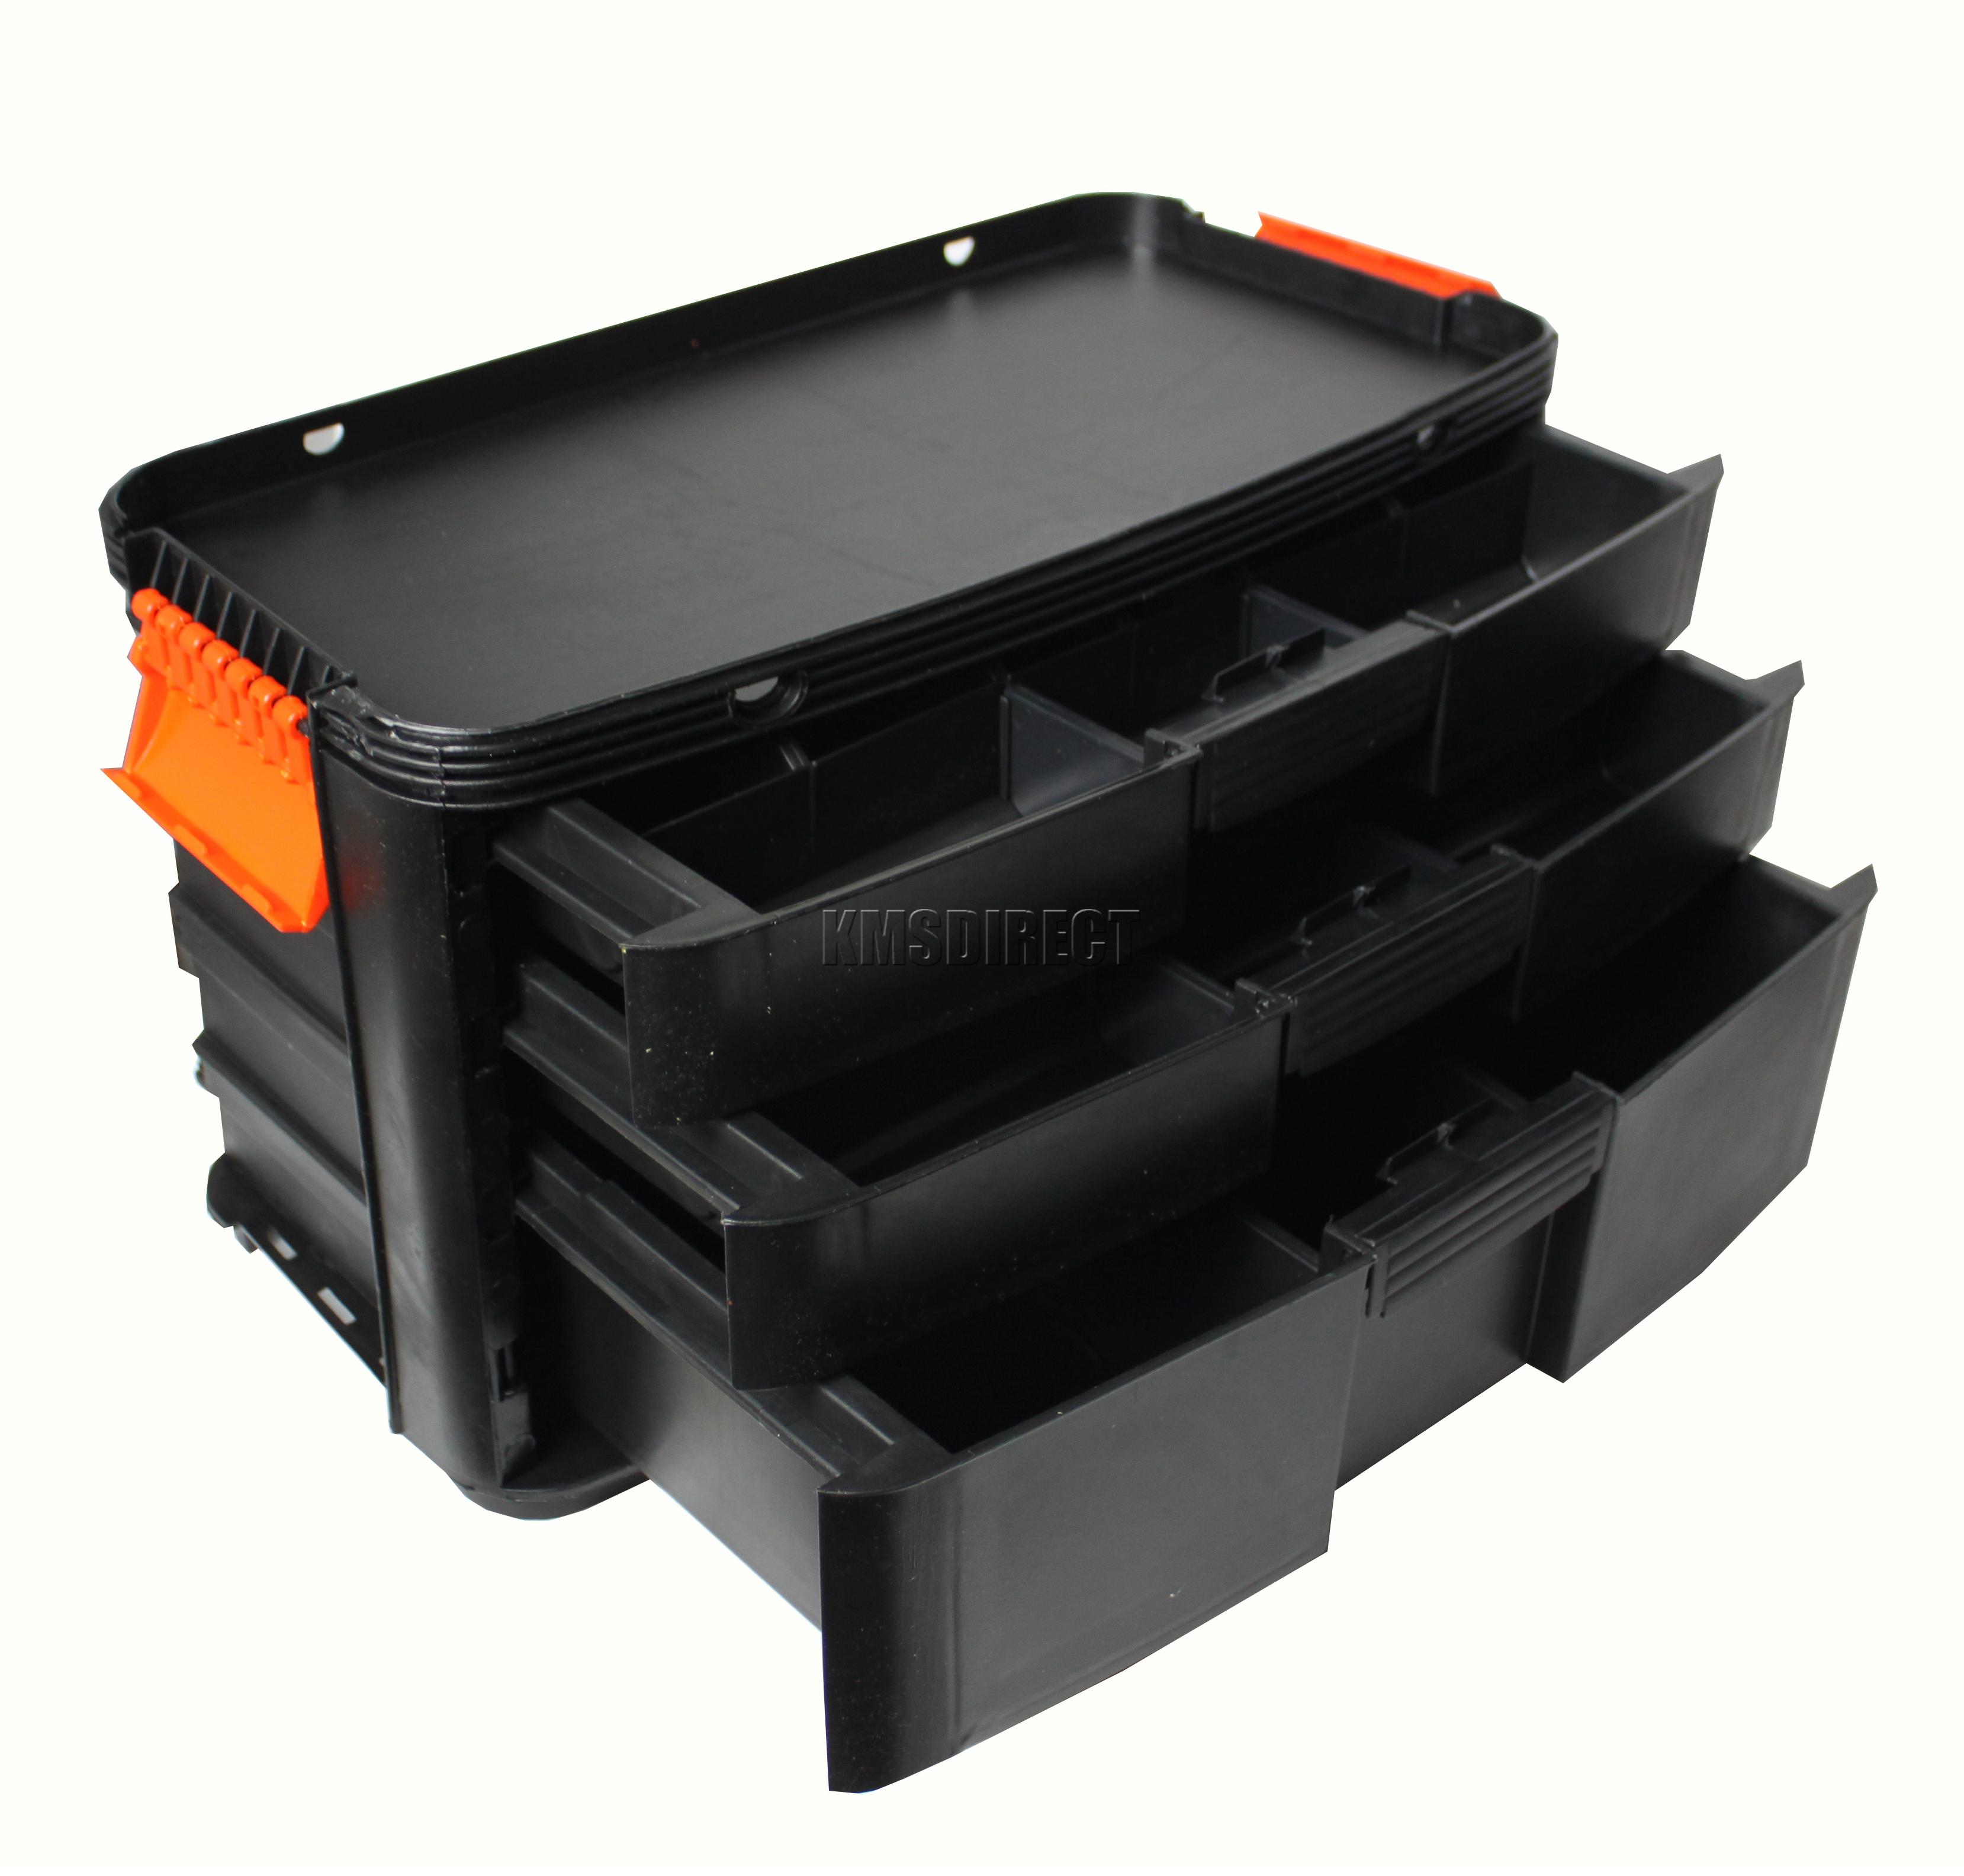 Mobile roller workshop chest trolley cart storage tool box toolbox wheel plastic ebay - Mobel roller teppiche ...